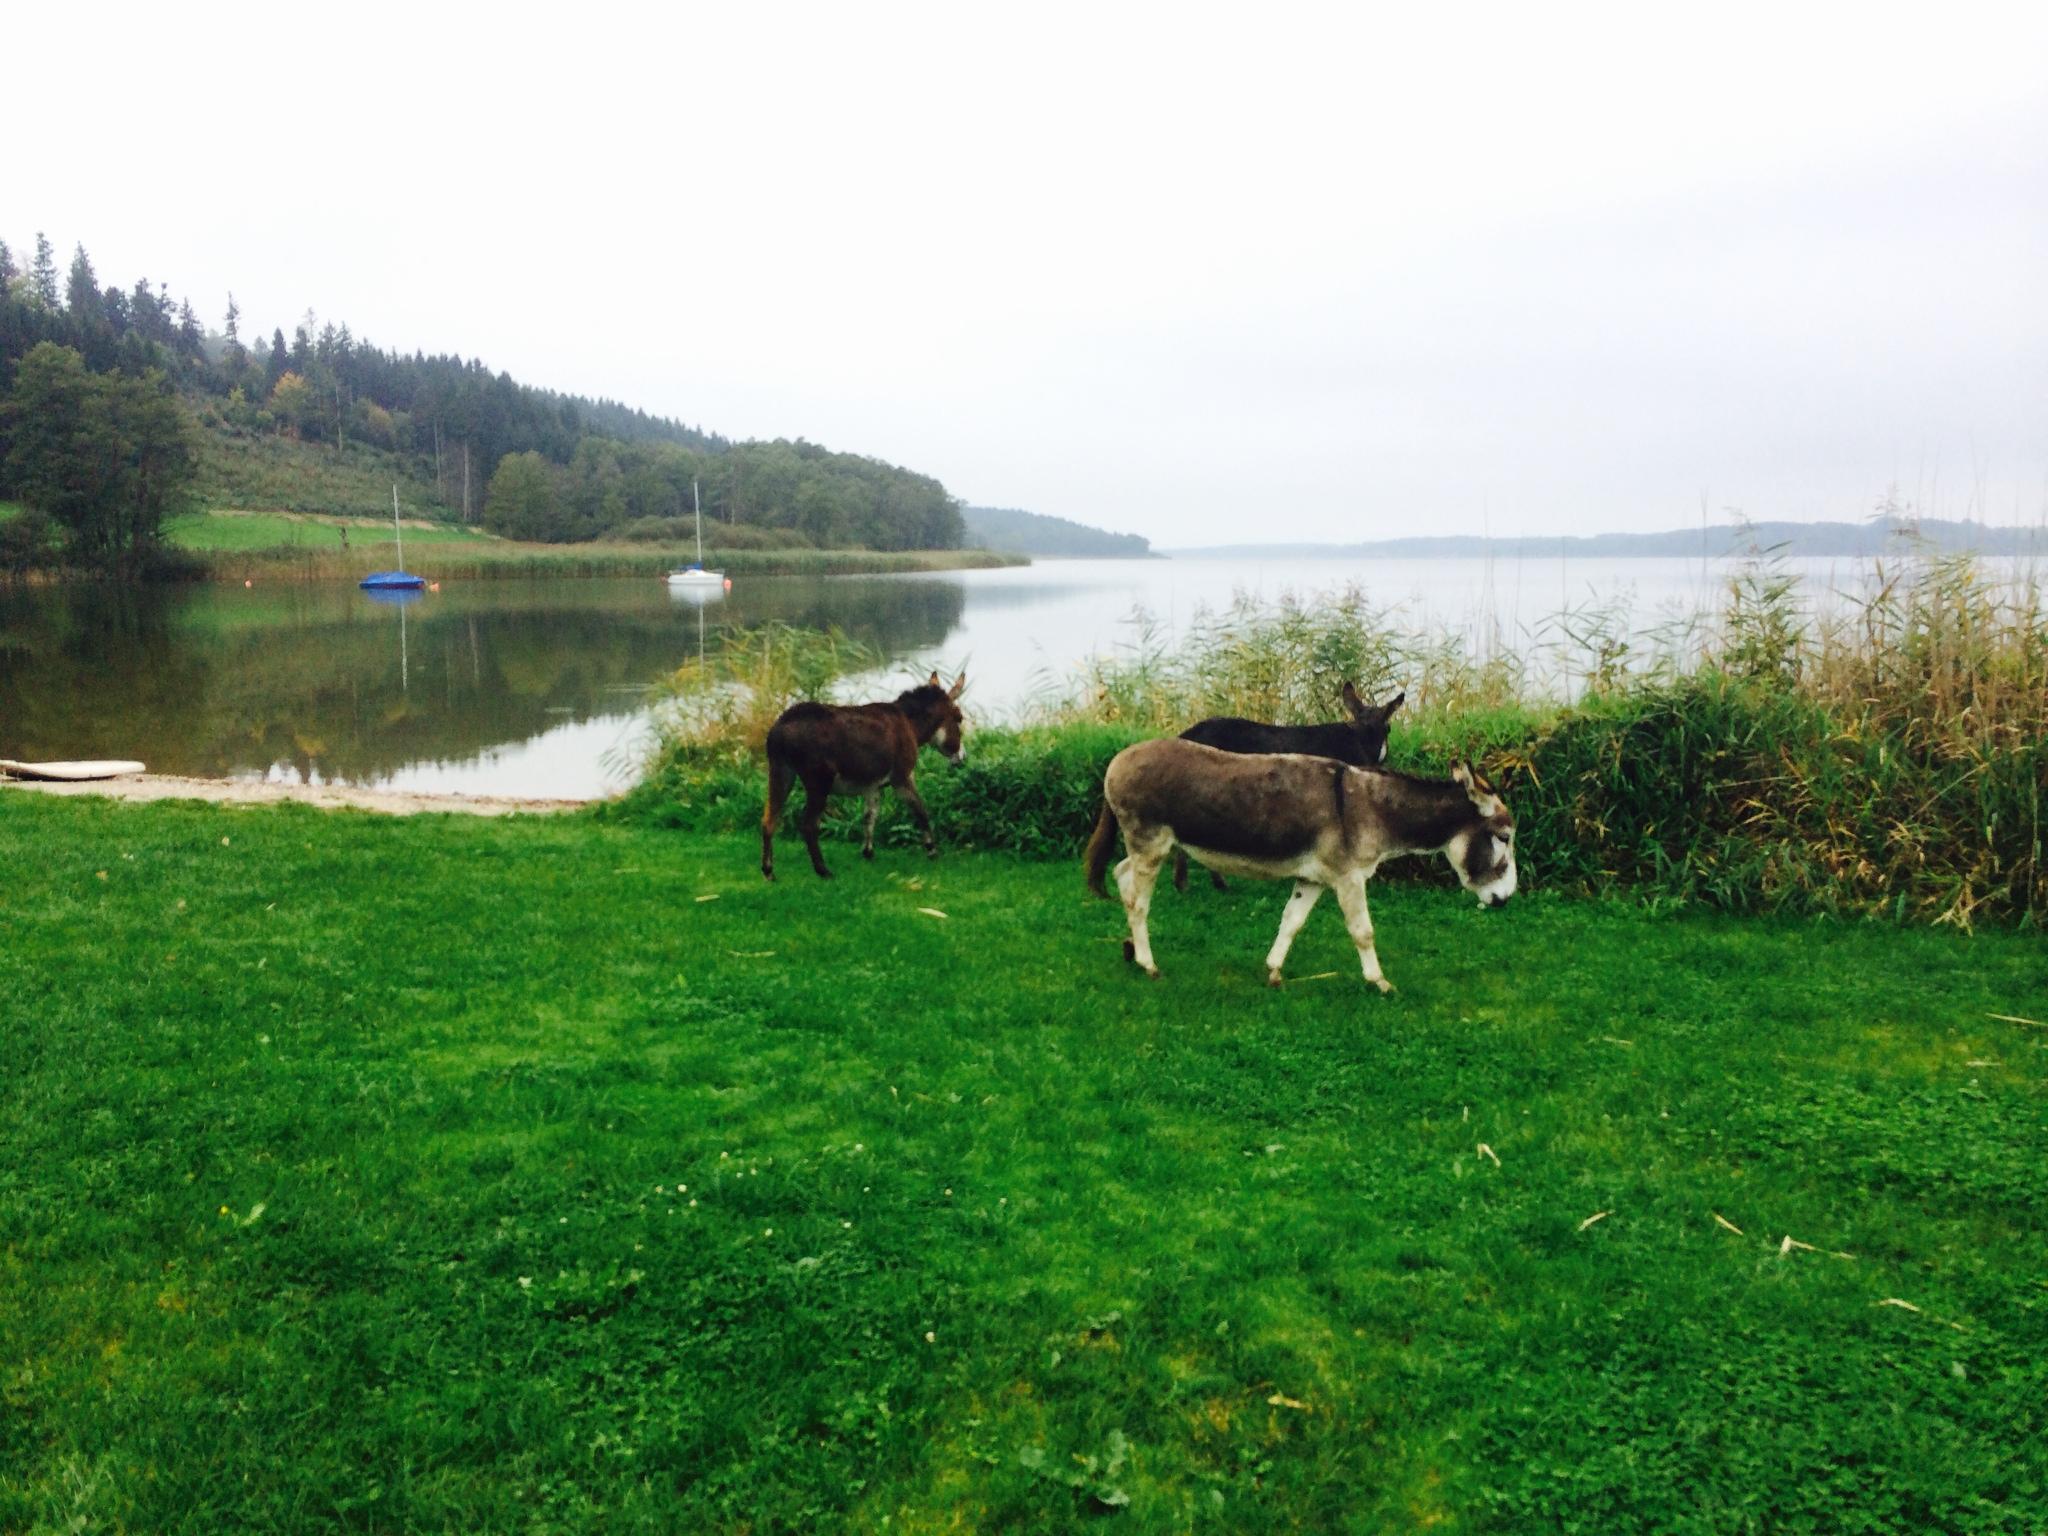 Esel Spaziergang zum See Camping Stein